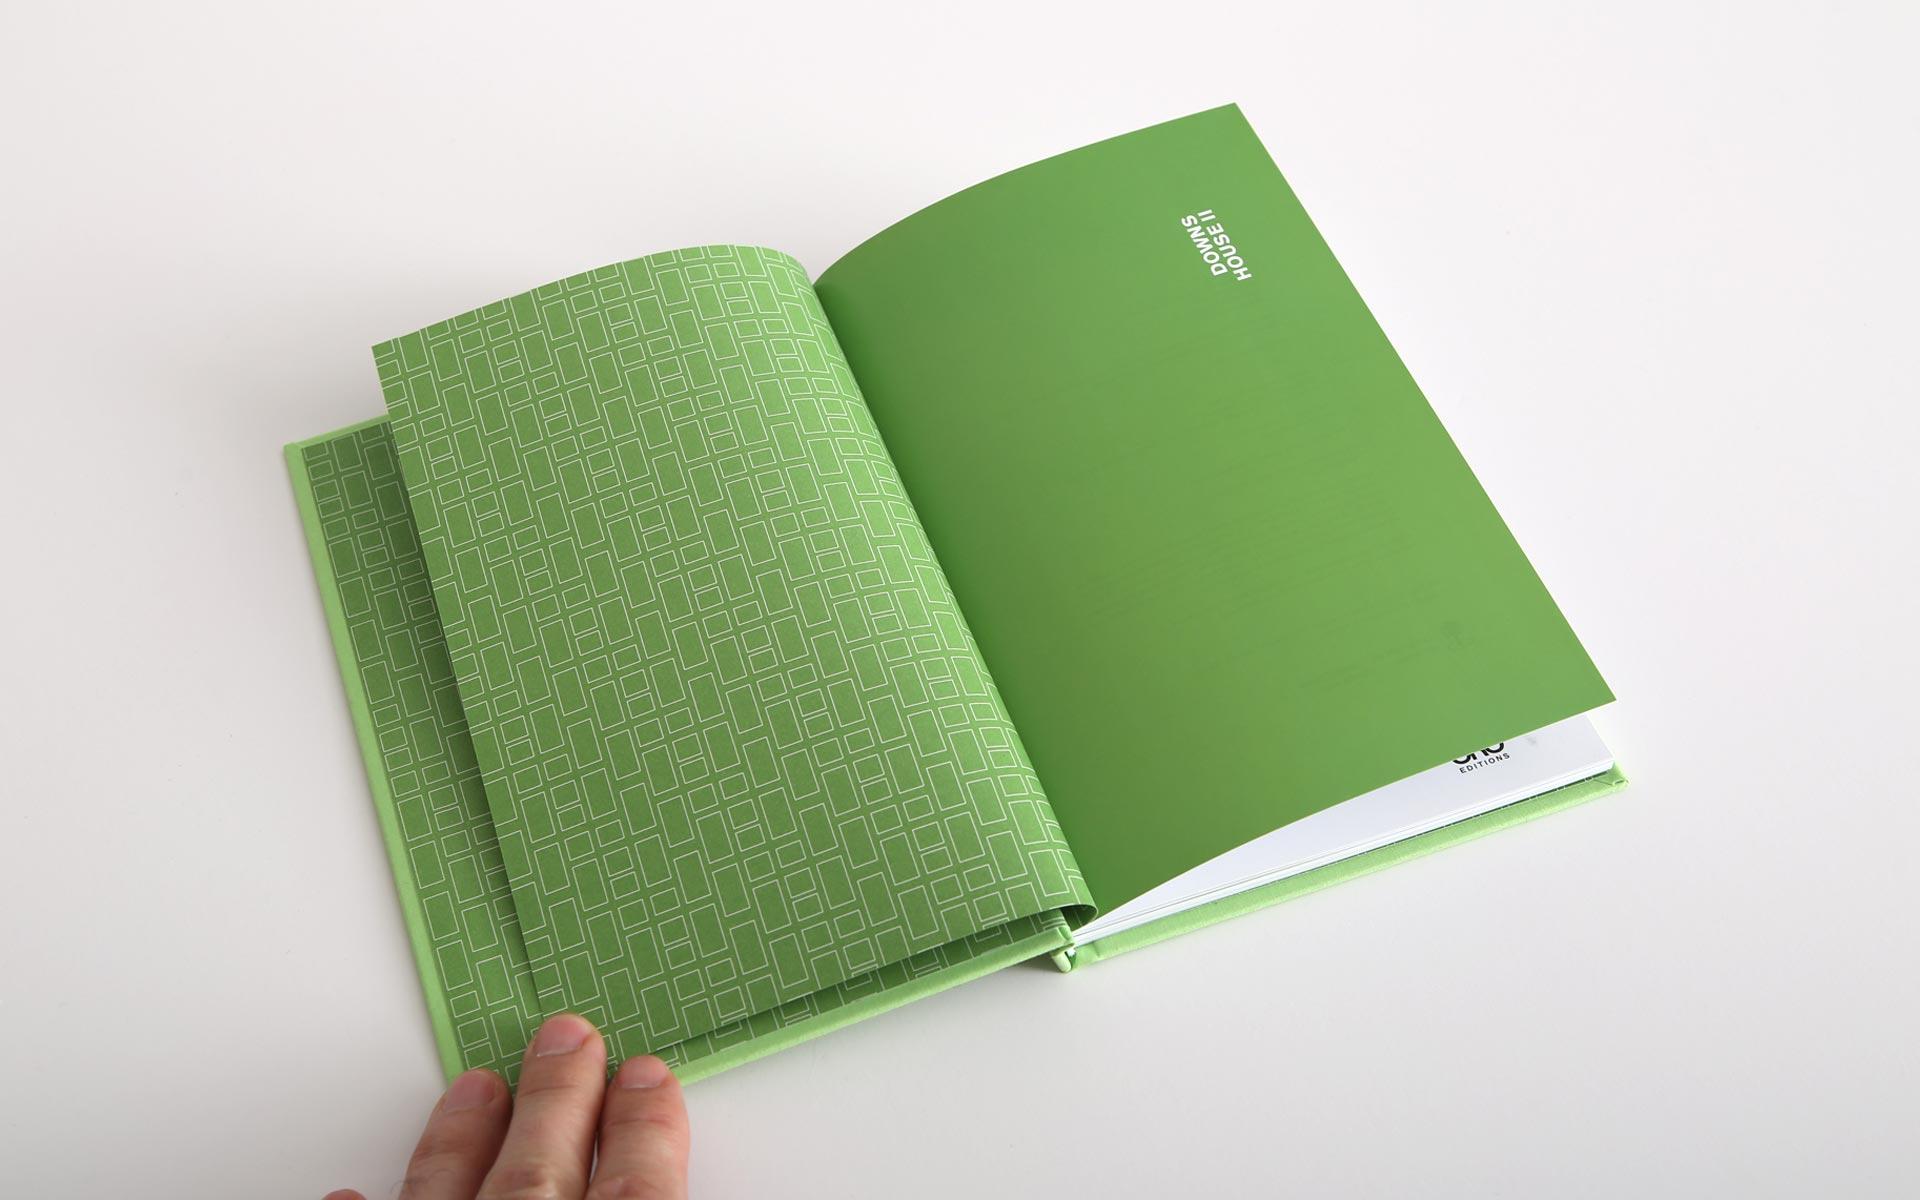 ubc-sala-book-design-3